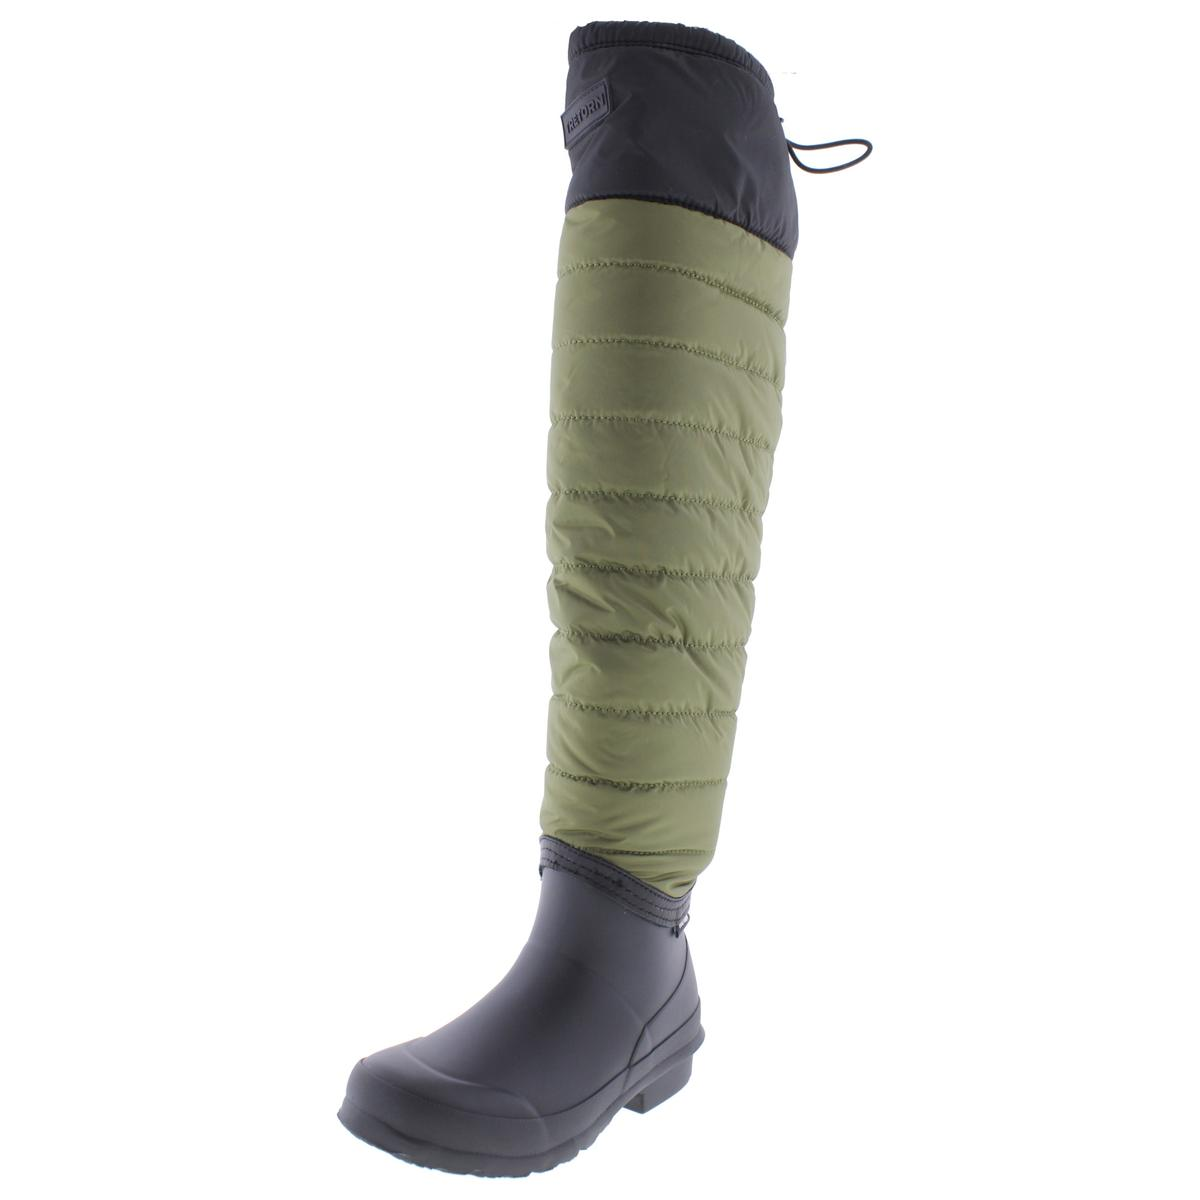 Tretorn Womens Harriet Nylon Over-The-Knee Rain Boots by Tretorn